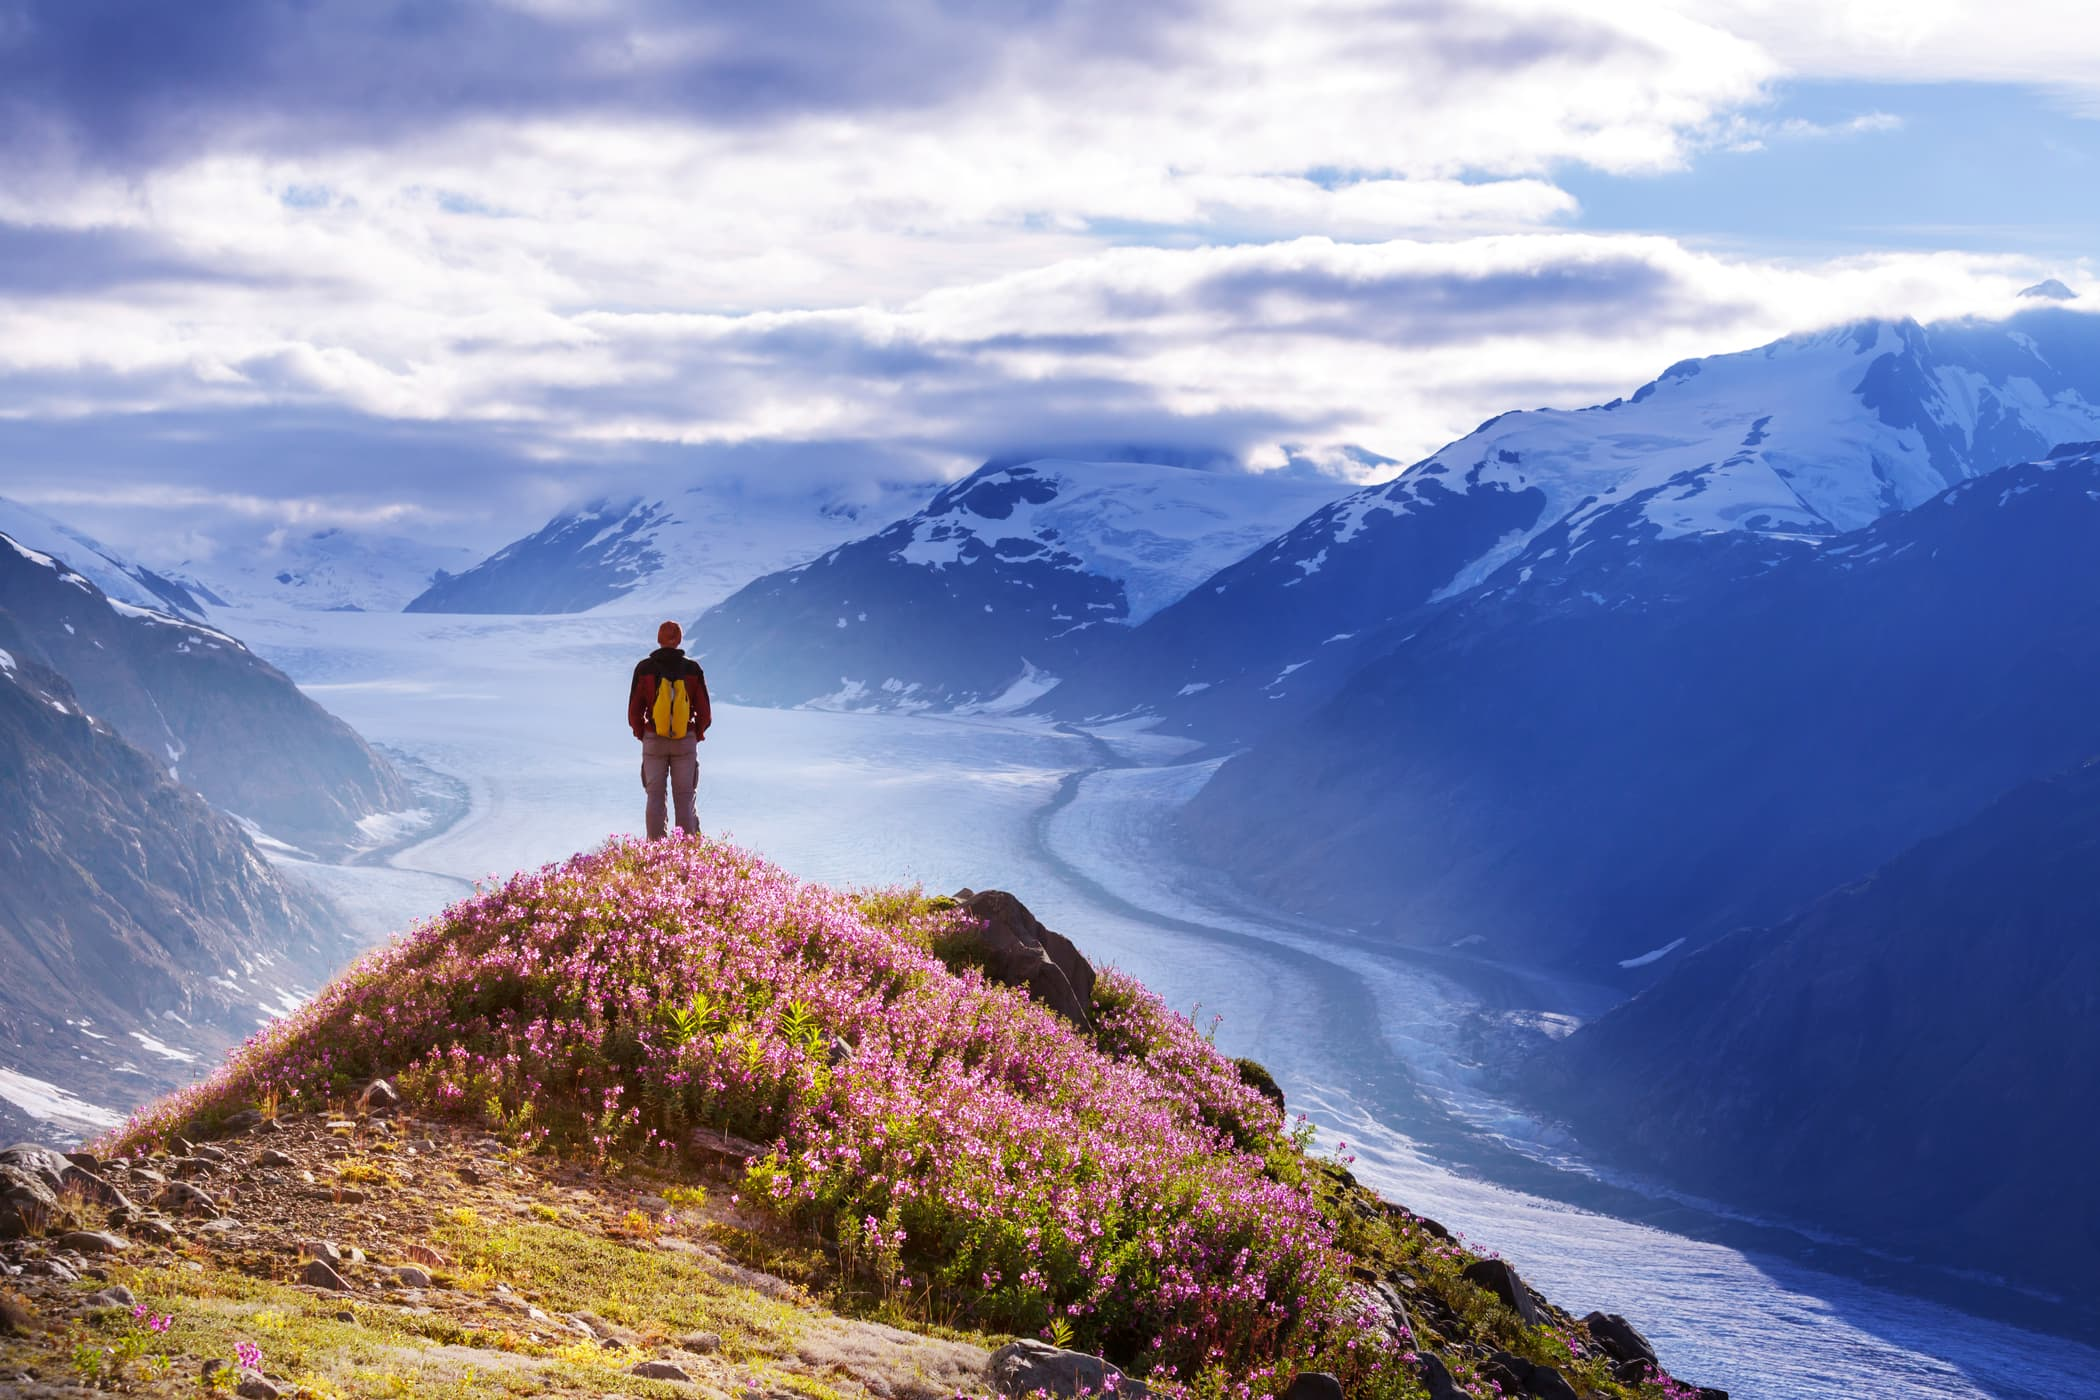 hiker standing on flower covered peak overlooking glacier field in Wrangell St Elias national park